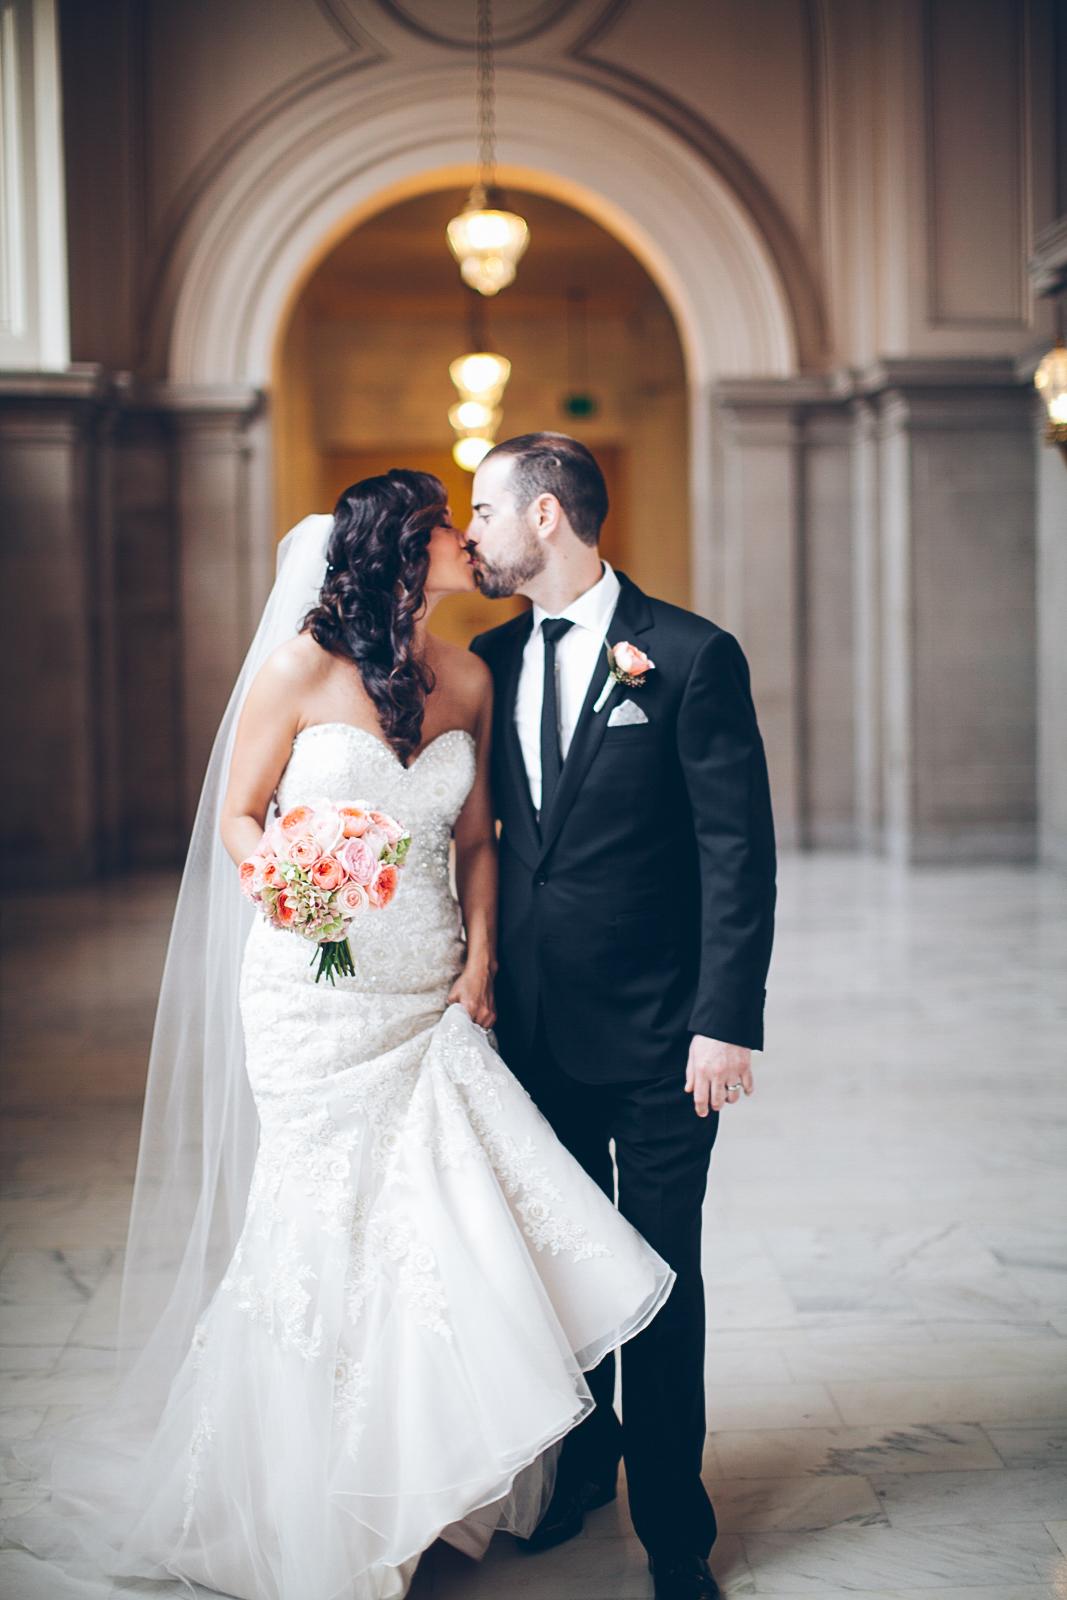 San_francisco_city_hall_wedding_photography_meegan_travis_ebony_siovhan_bokeh_photography_37.jpg